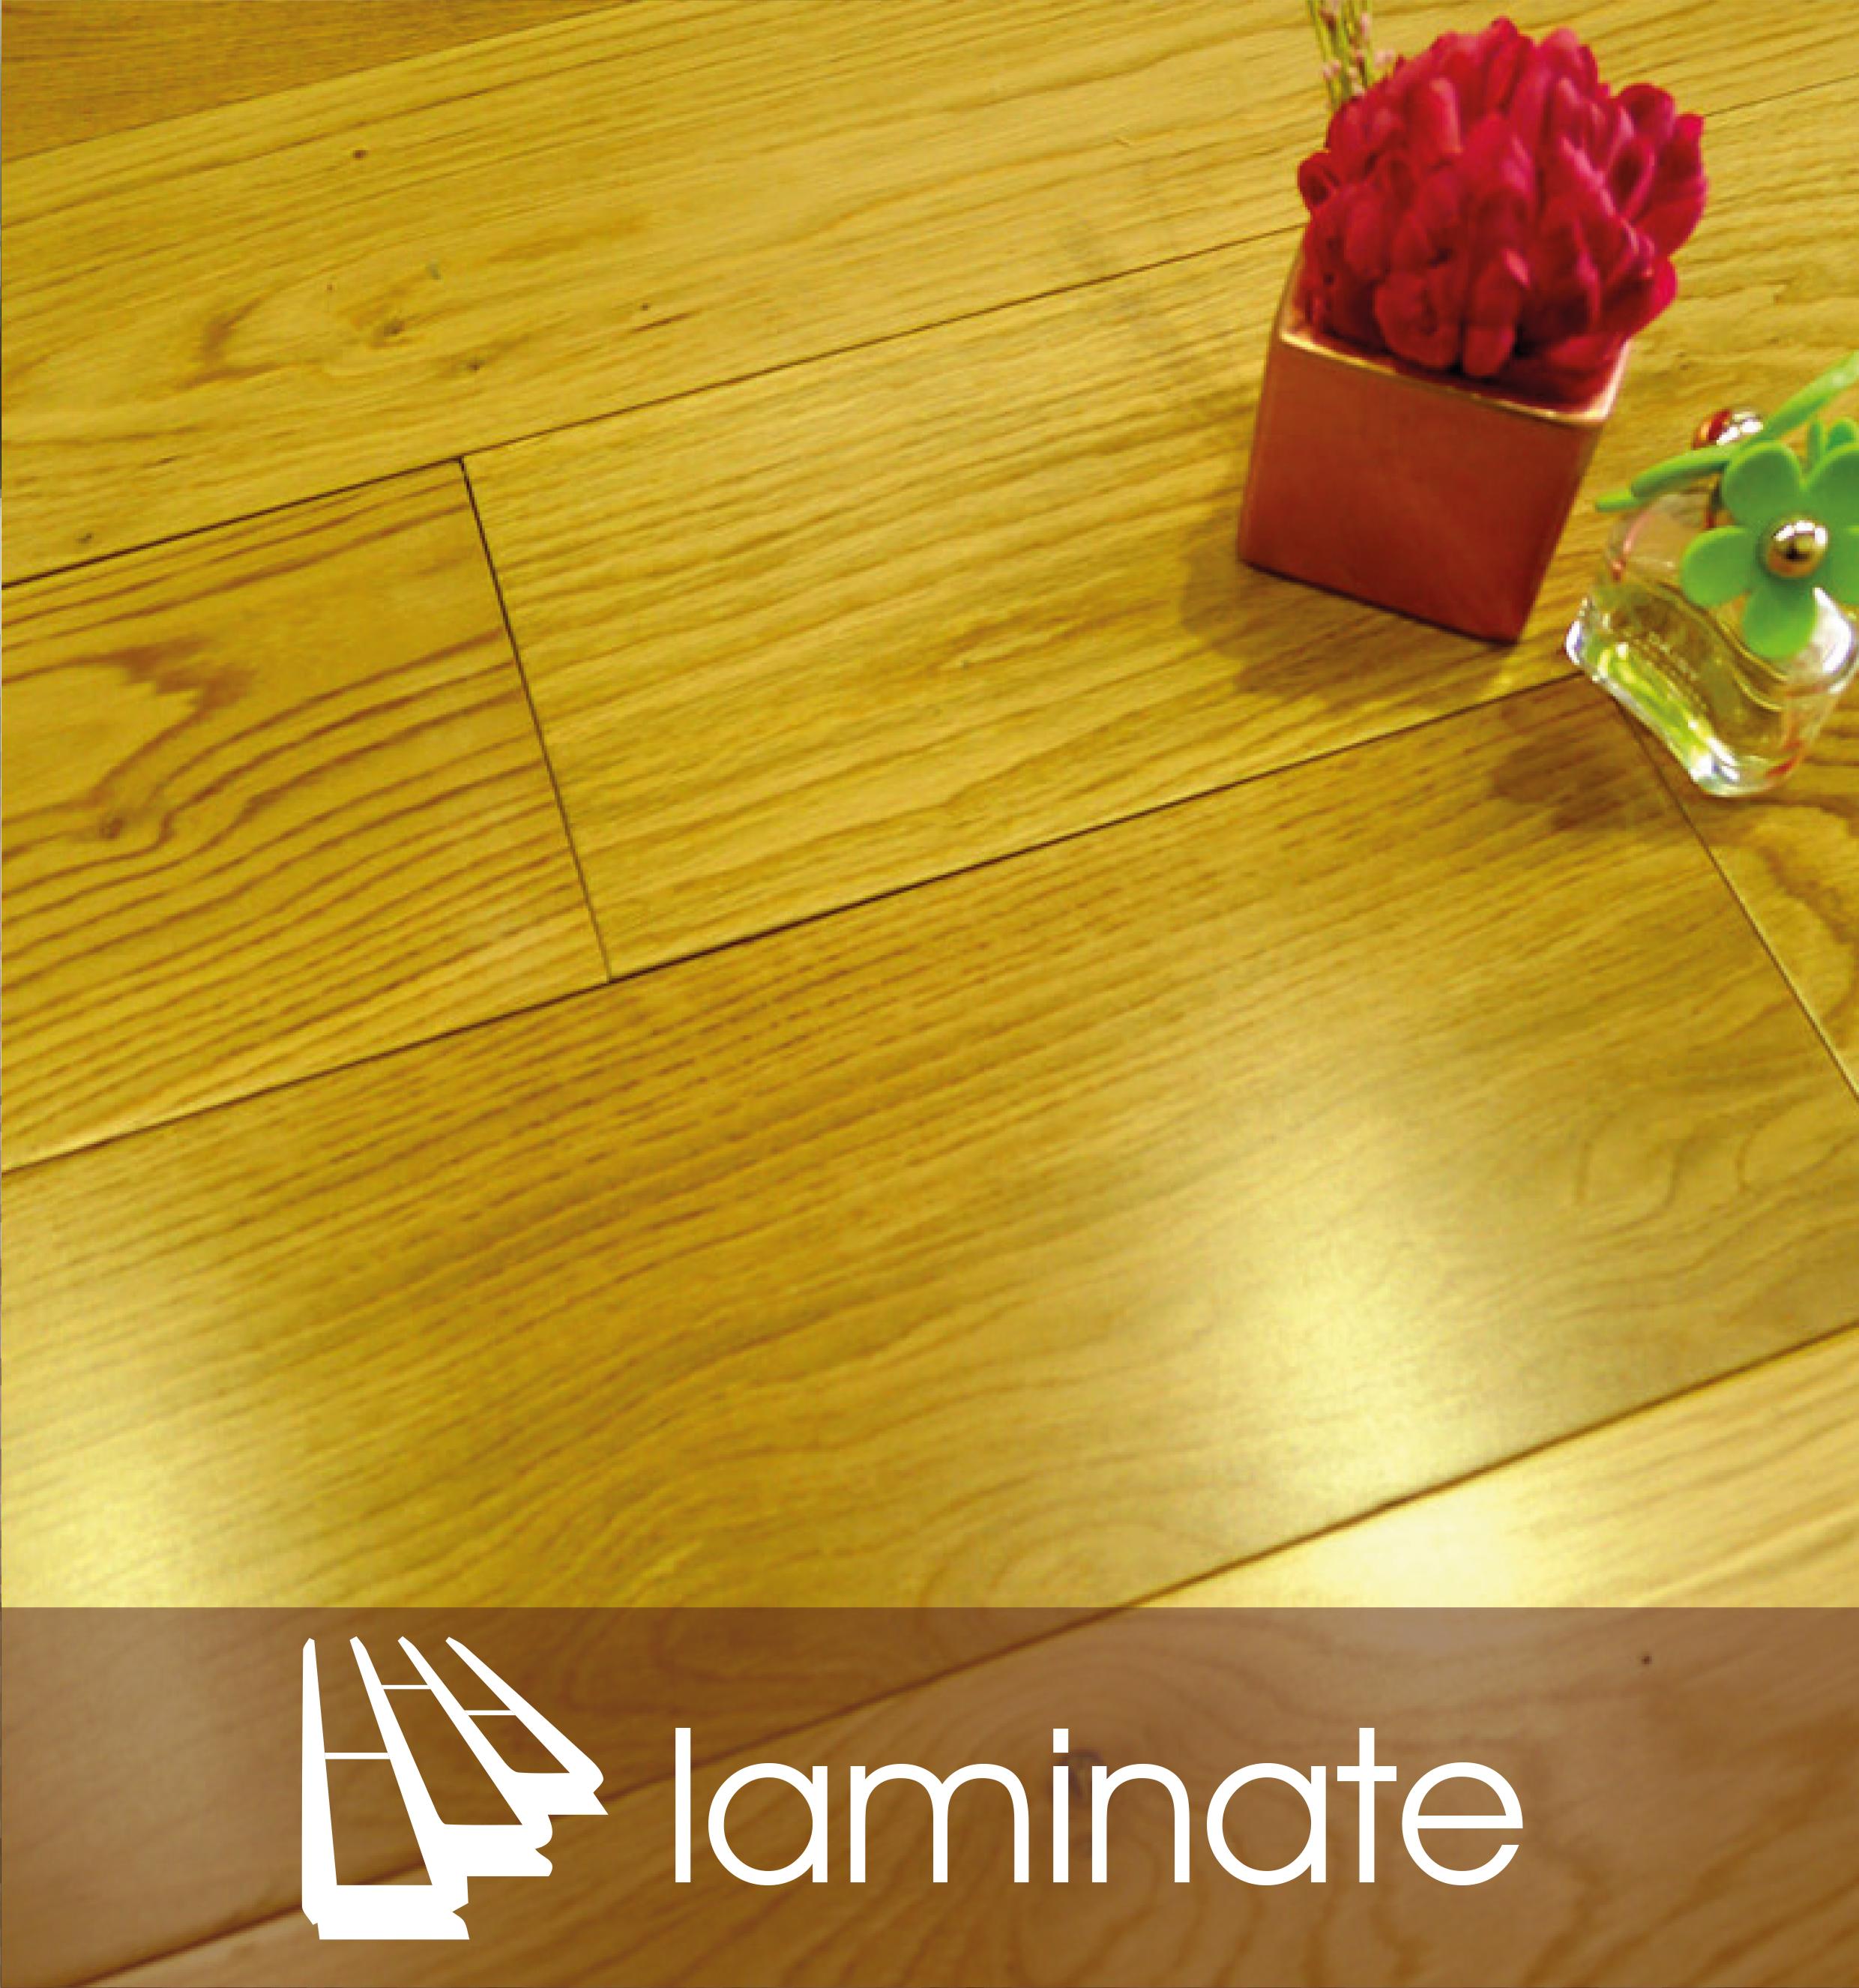 At Celtic Flooring Supplies We Offer Laminate Flooring In Cardiff Real Wood Flooring In Cardiff We Specialise In Car Cheap Flooring Real Wood Floors Flooring